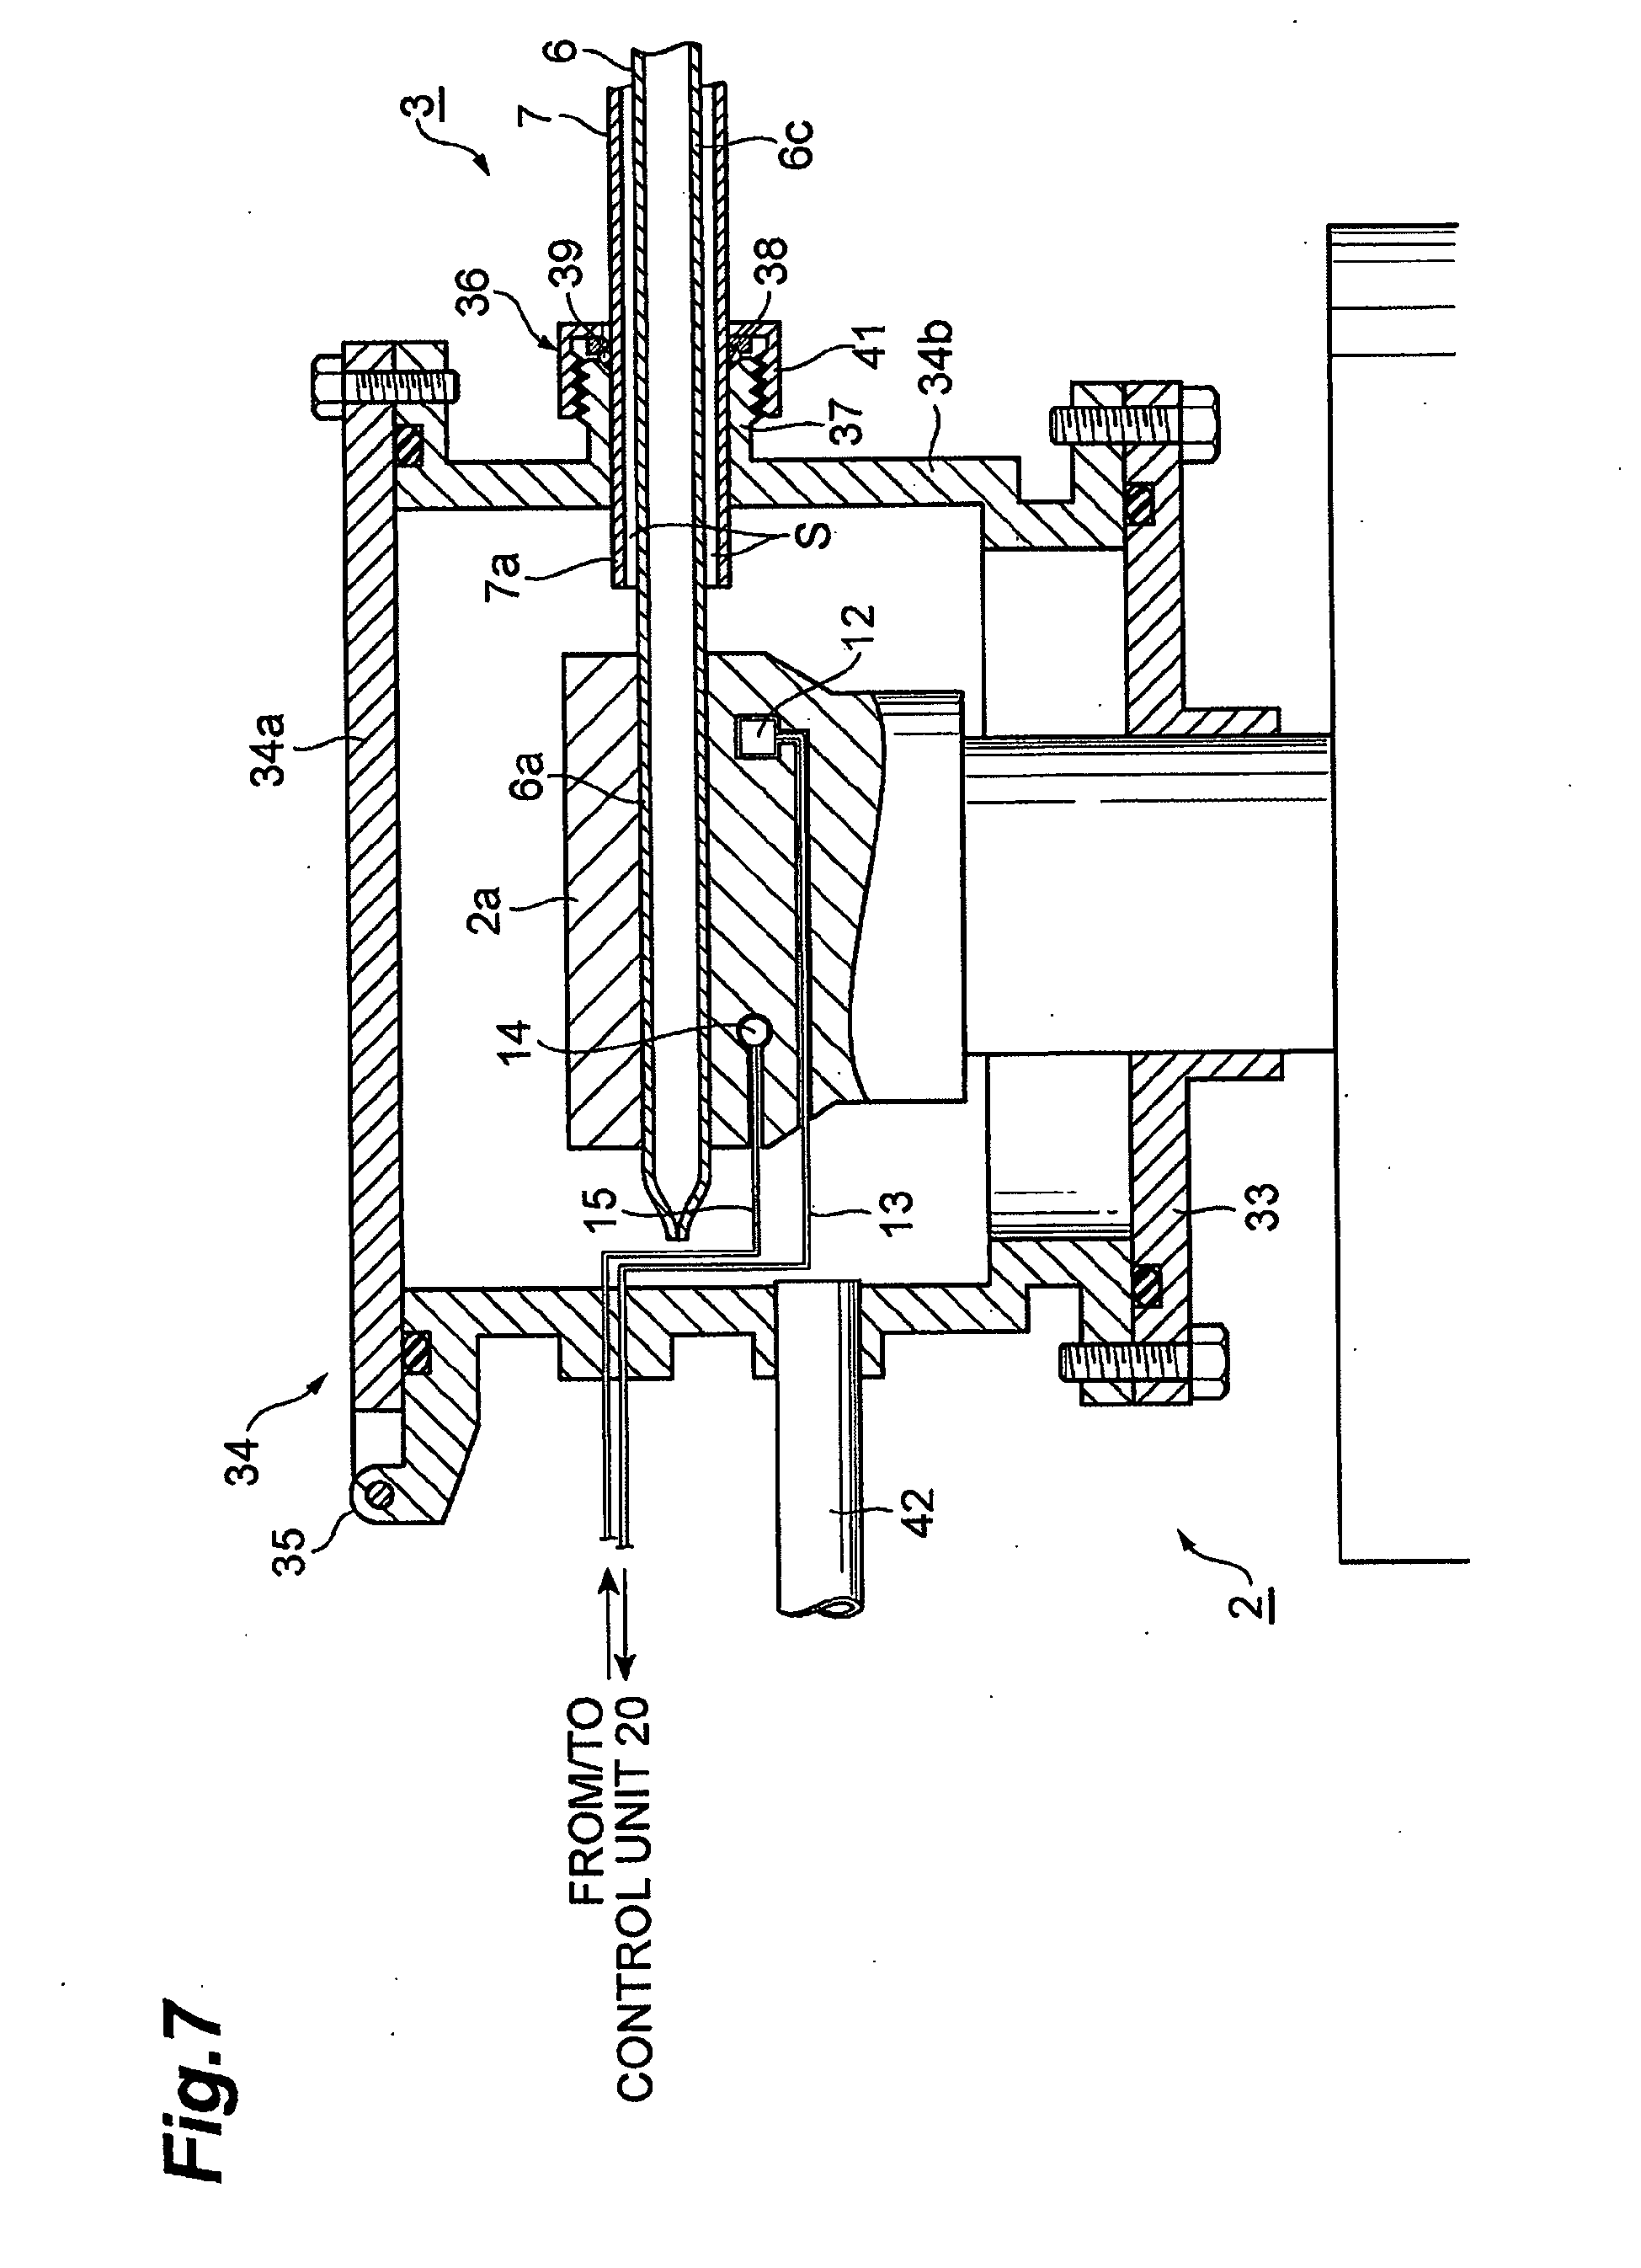 Fine afm vg30 e engine wiring diagram gallery electrical diagram